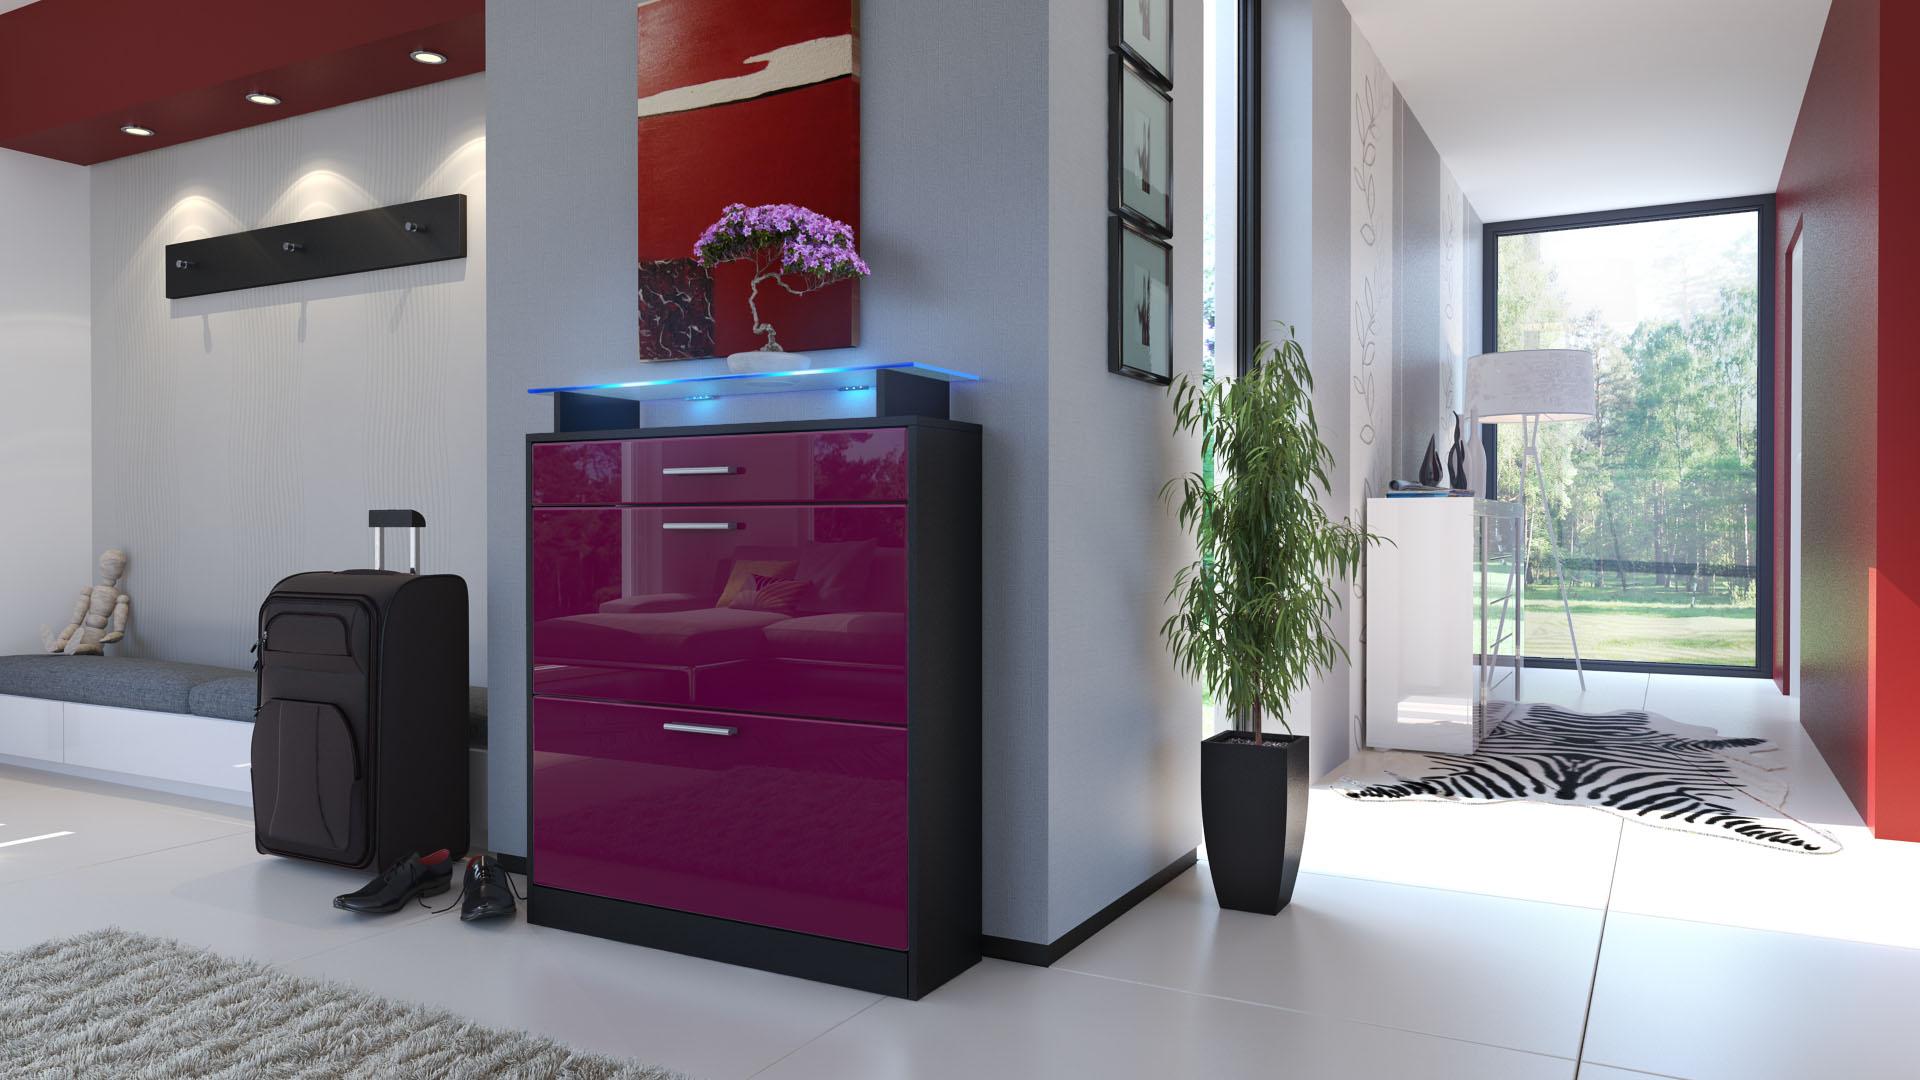 schuhschrank schuhkipper schuh regal loret schwarz hochglanz matt naturt ne ebay. Black Bedroom Furniture Sets. Home Design Ideas